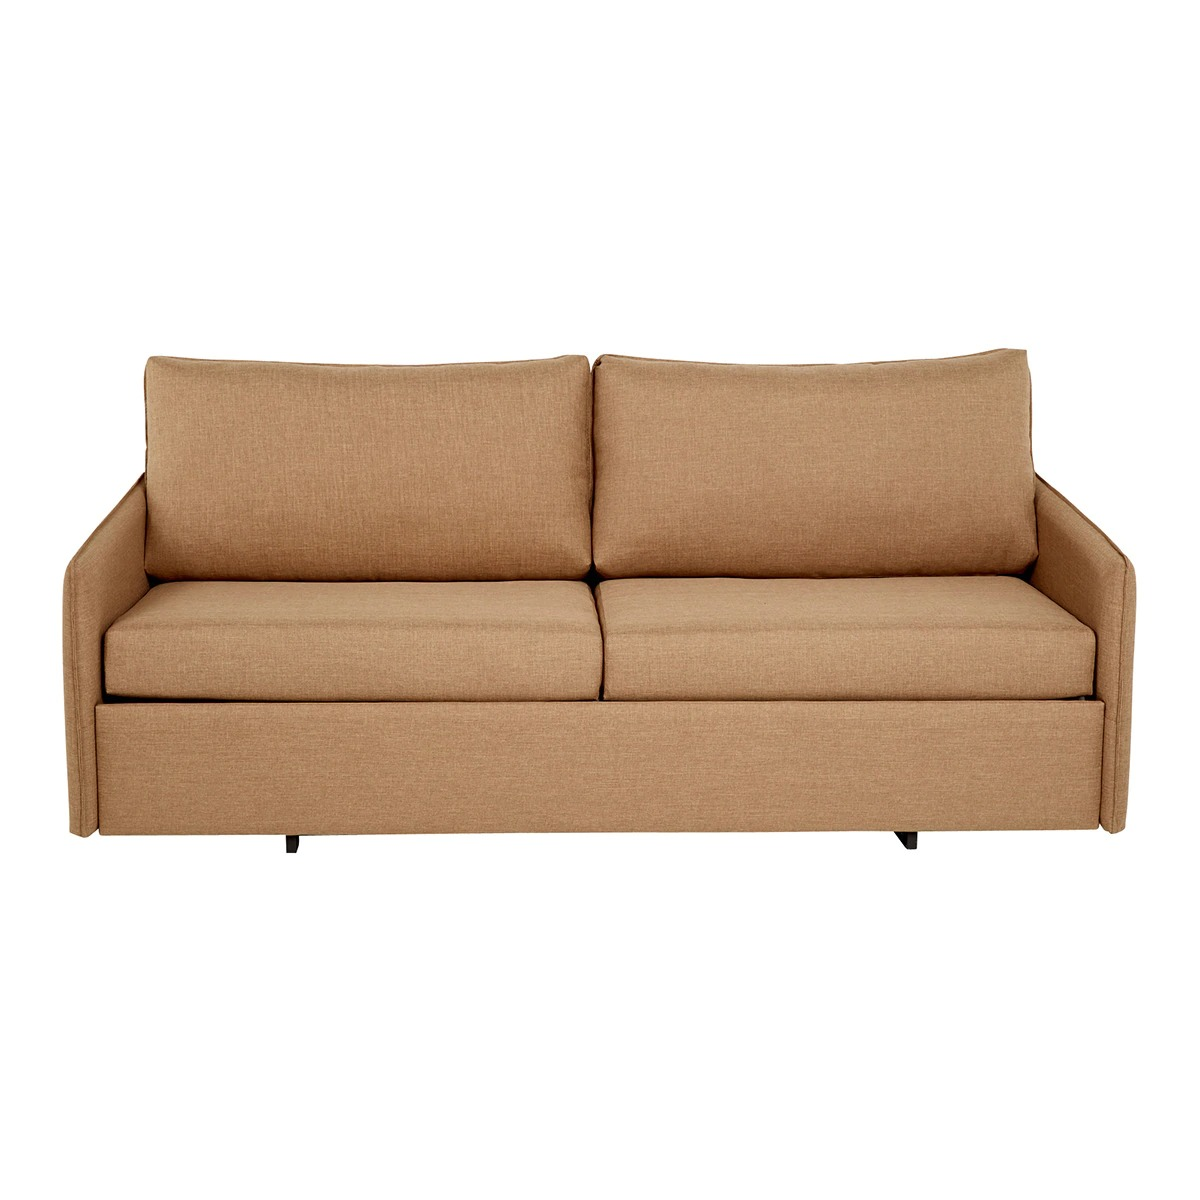 Saona upholstered sofa bed